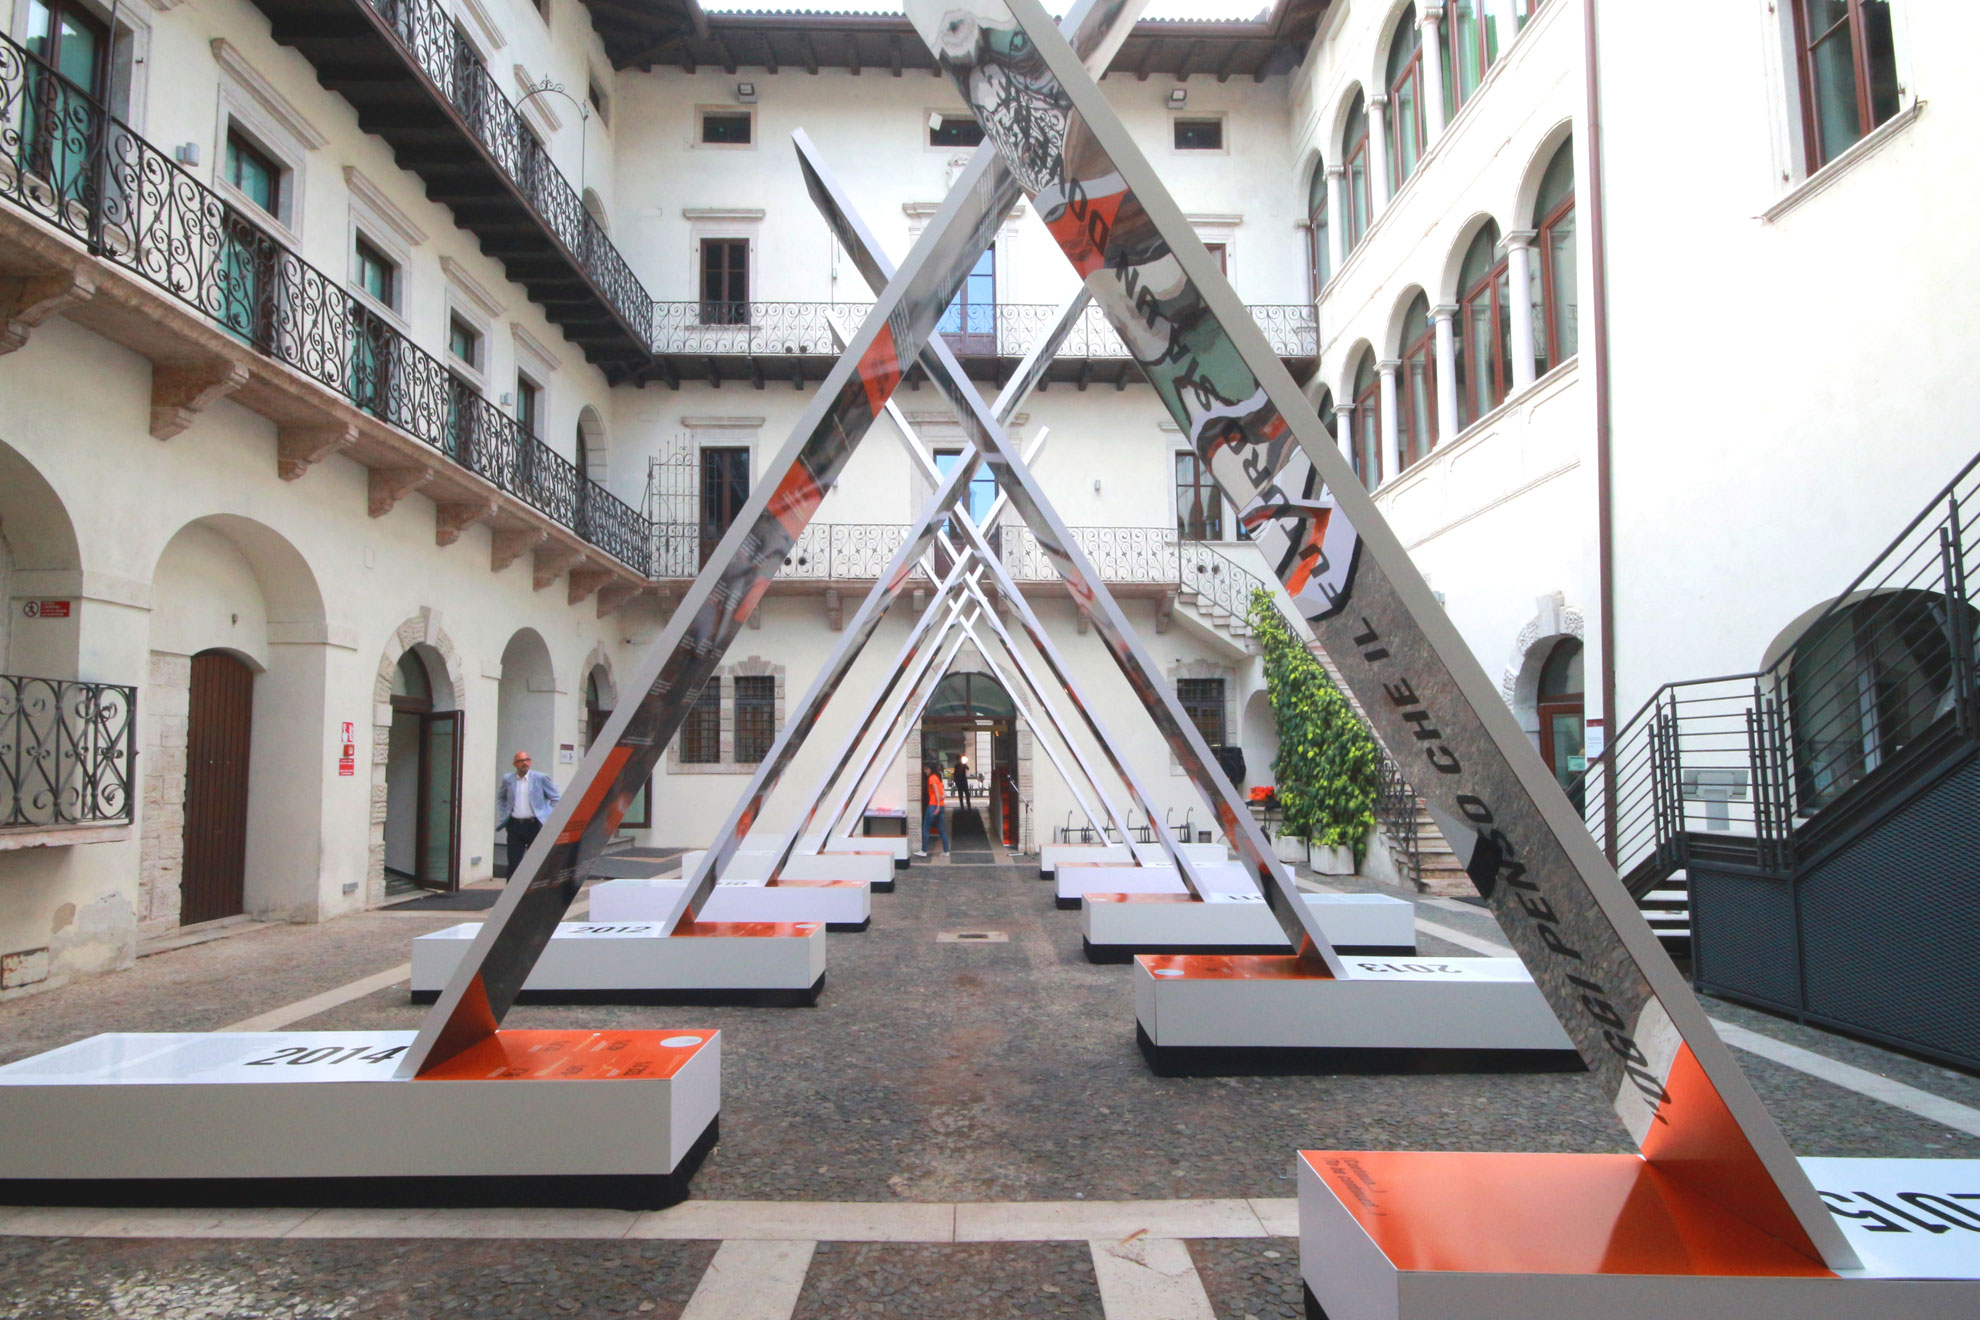 Trento - Palazzo Sardagna